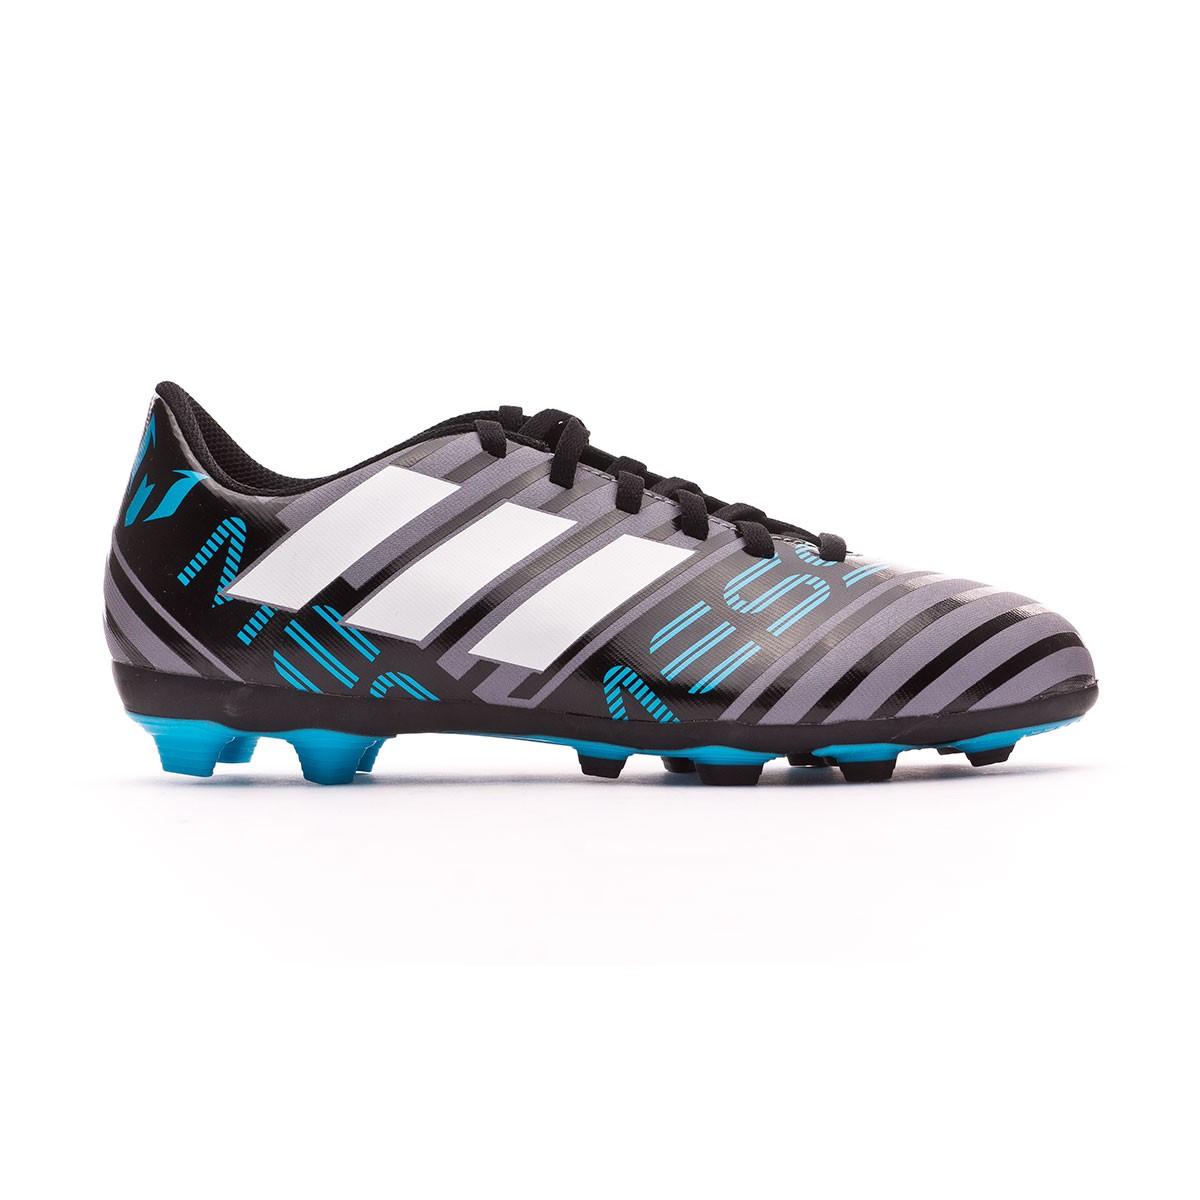 590ac3be54d Football Boots adidas Kids Nemeziz Messi 17.4 AG Grey-White-Core black -  Football store Fútbol Emotion